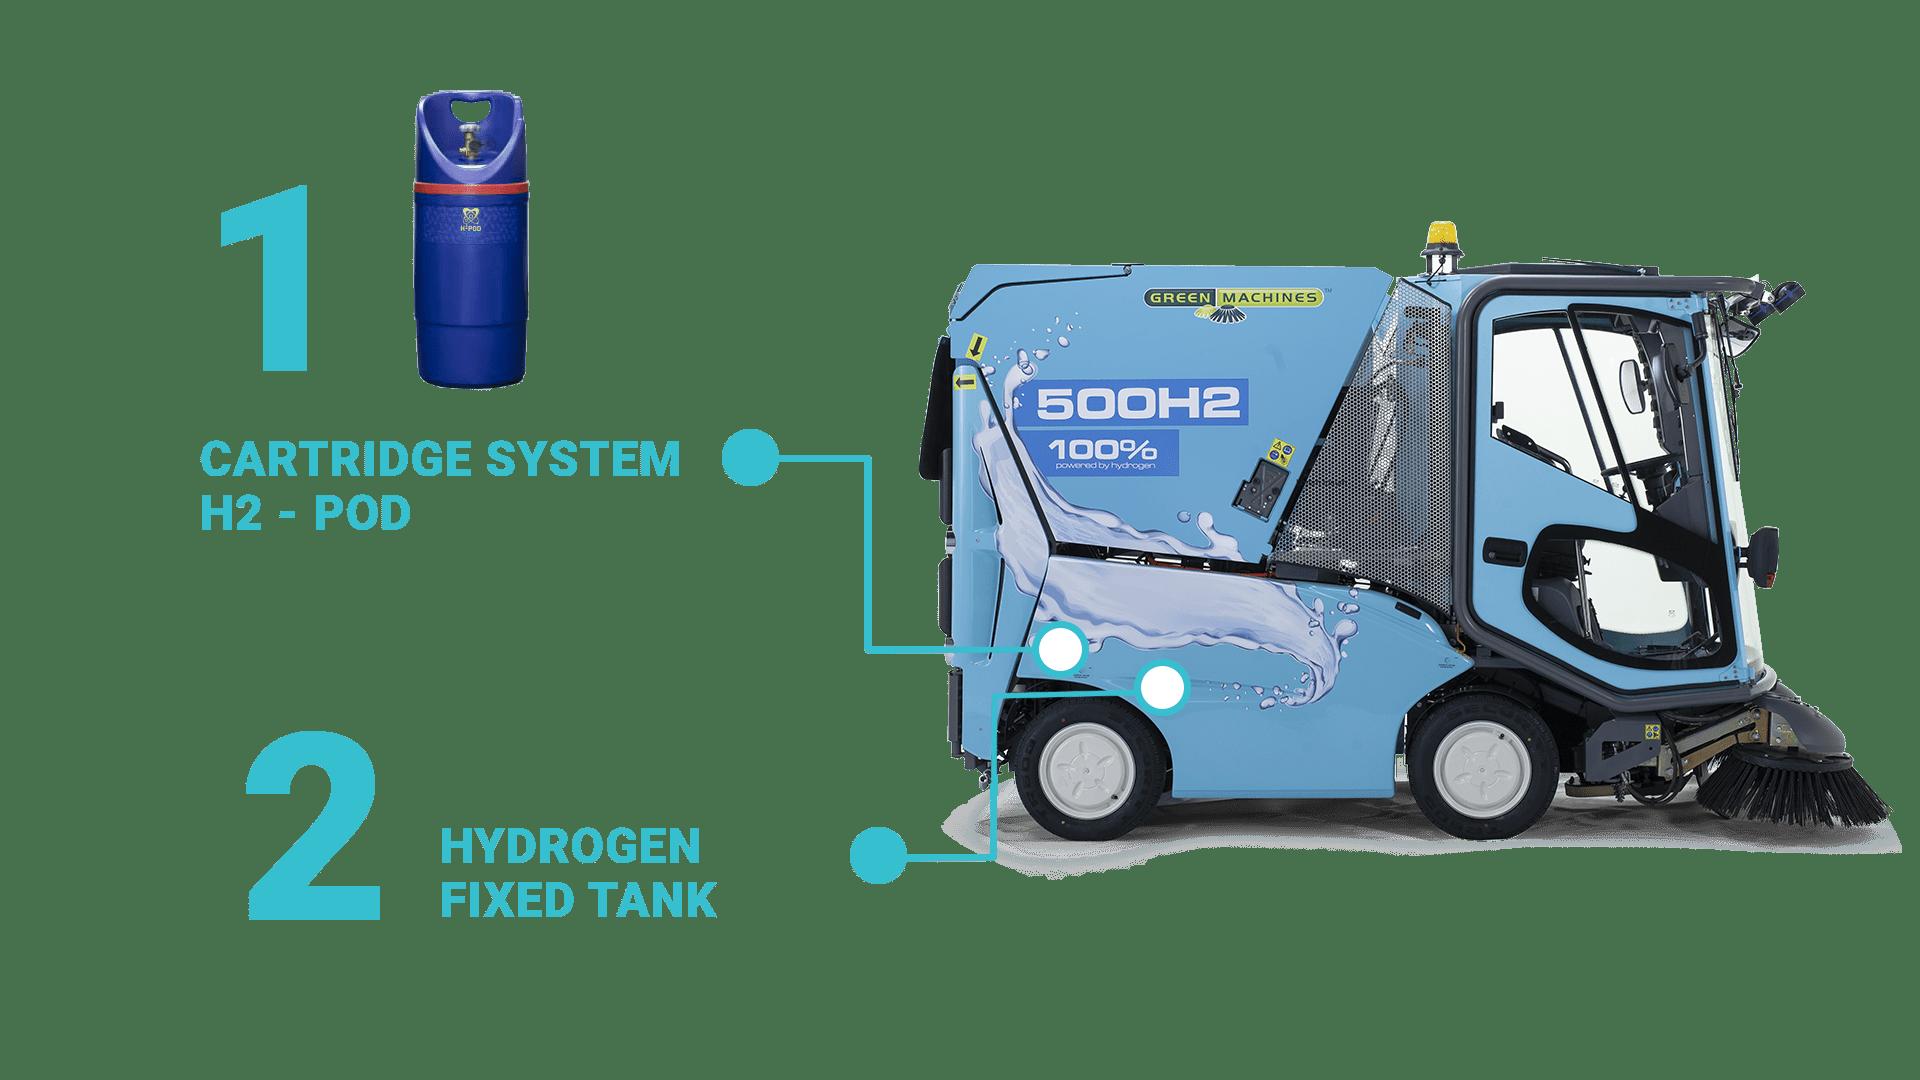 greenmachines-500-h2-cartridge-system